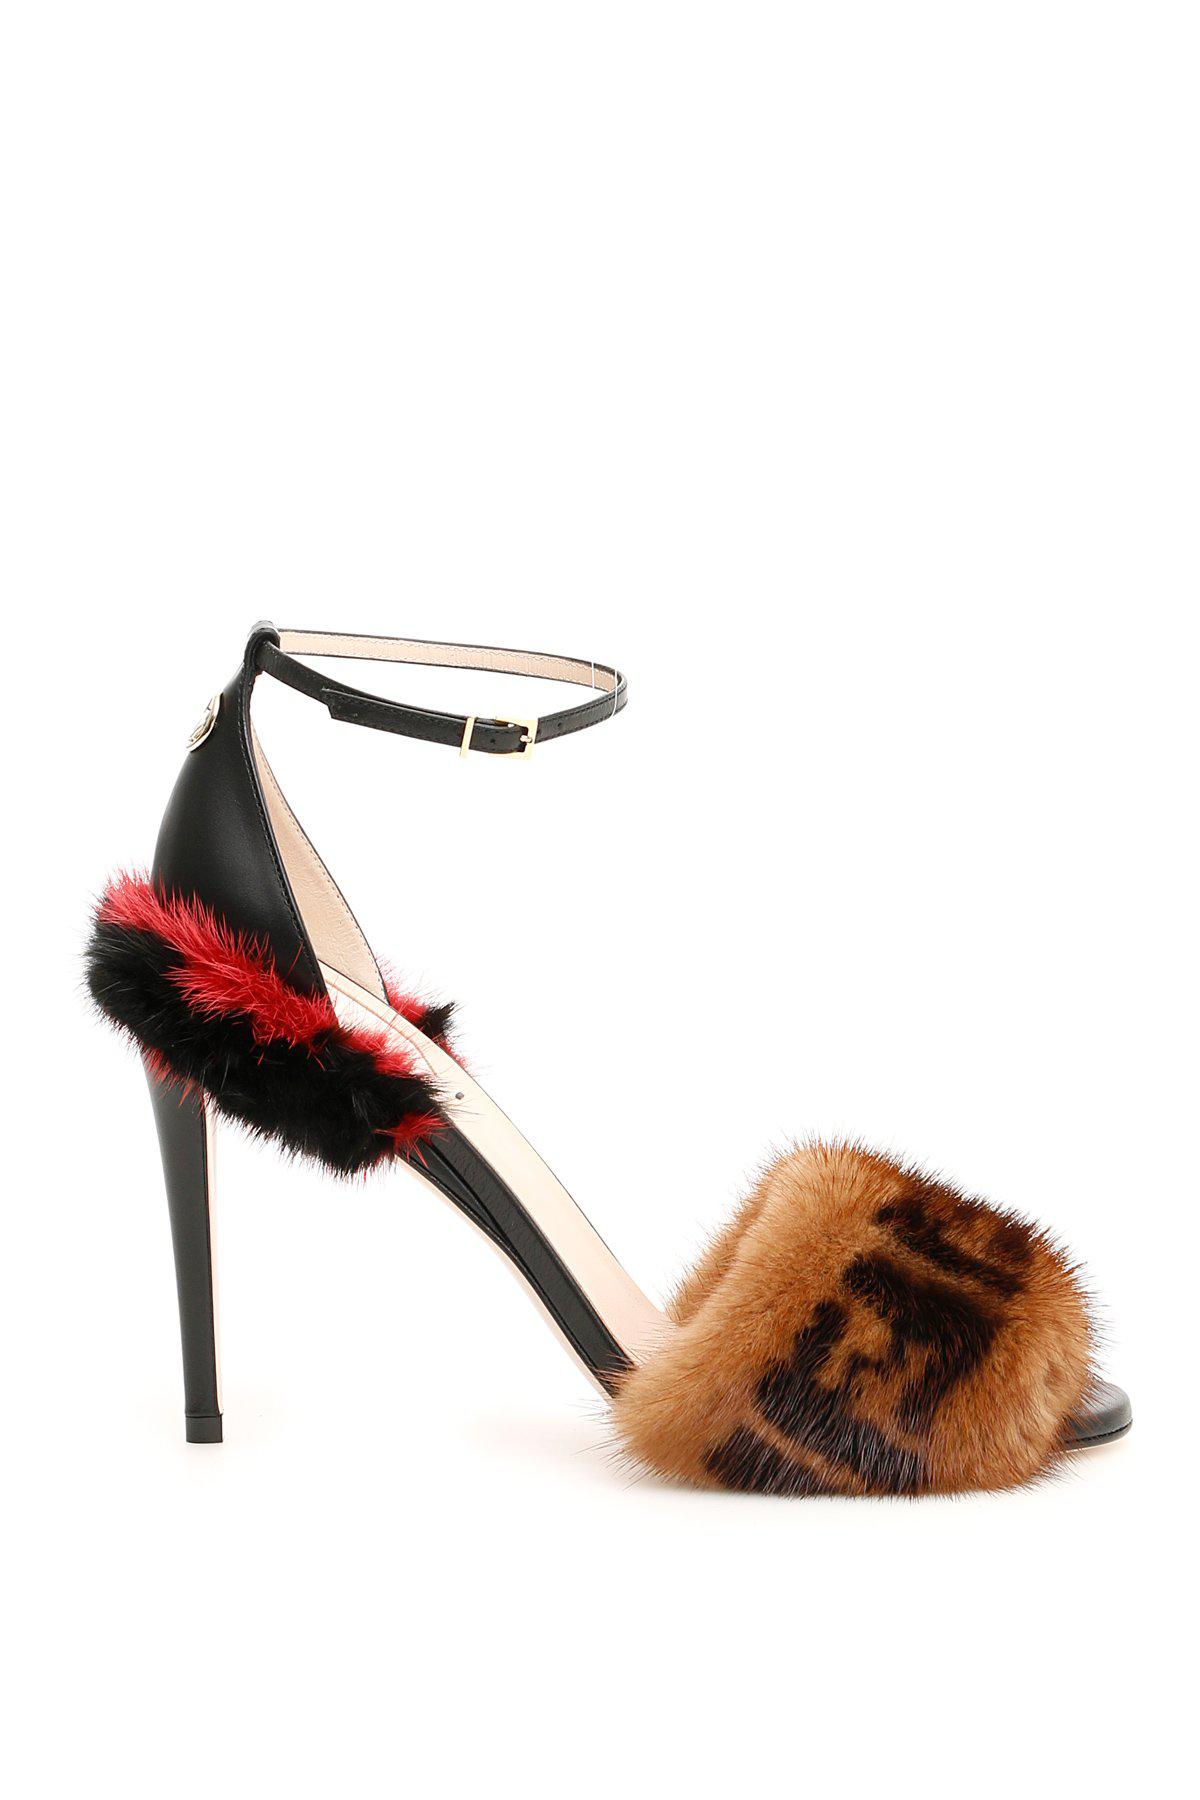 d850a53d6d77 Lyst - Fendi Mink Fur Ff Sandals in Brown